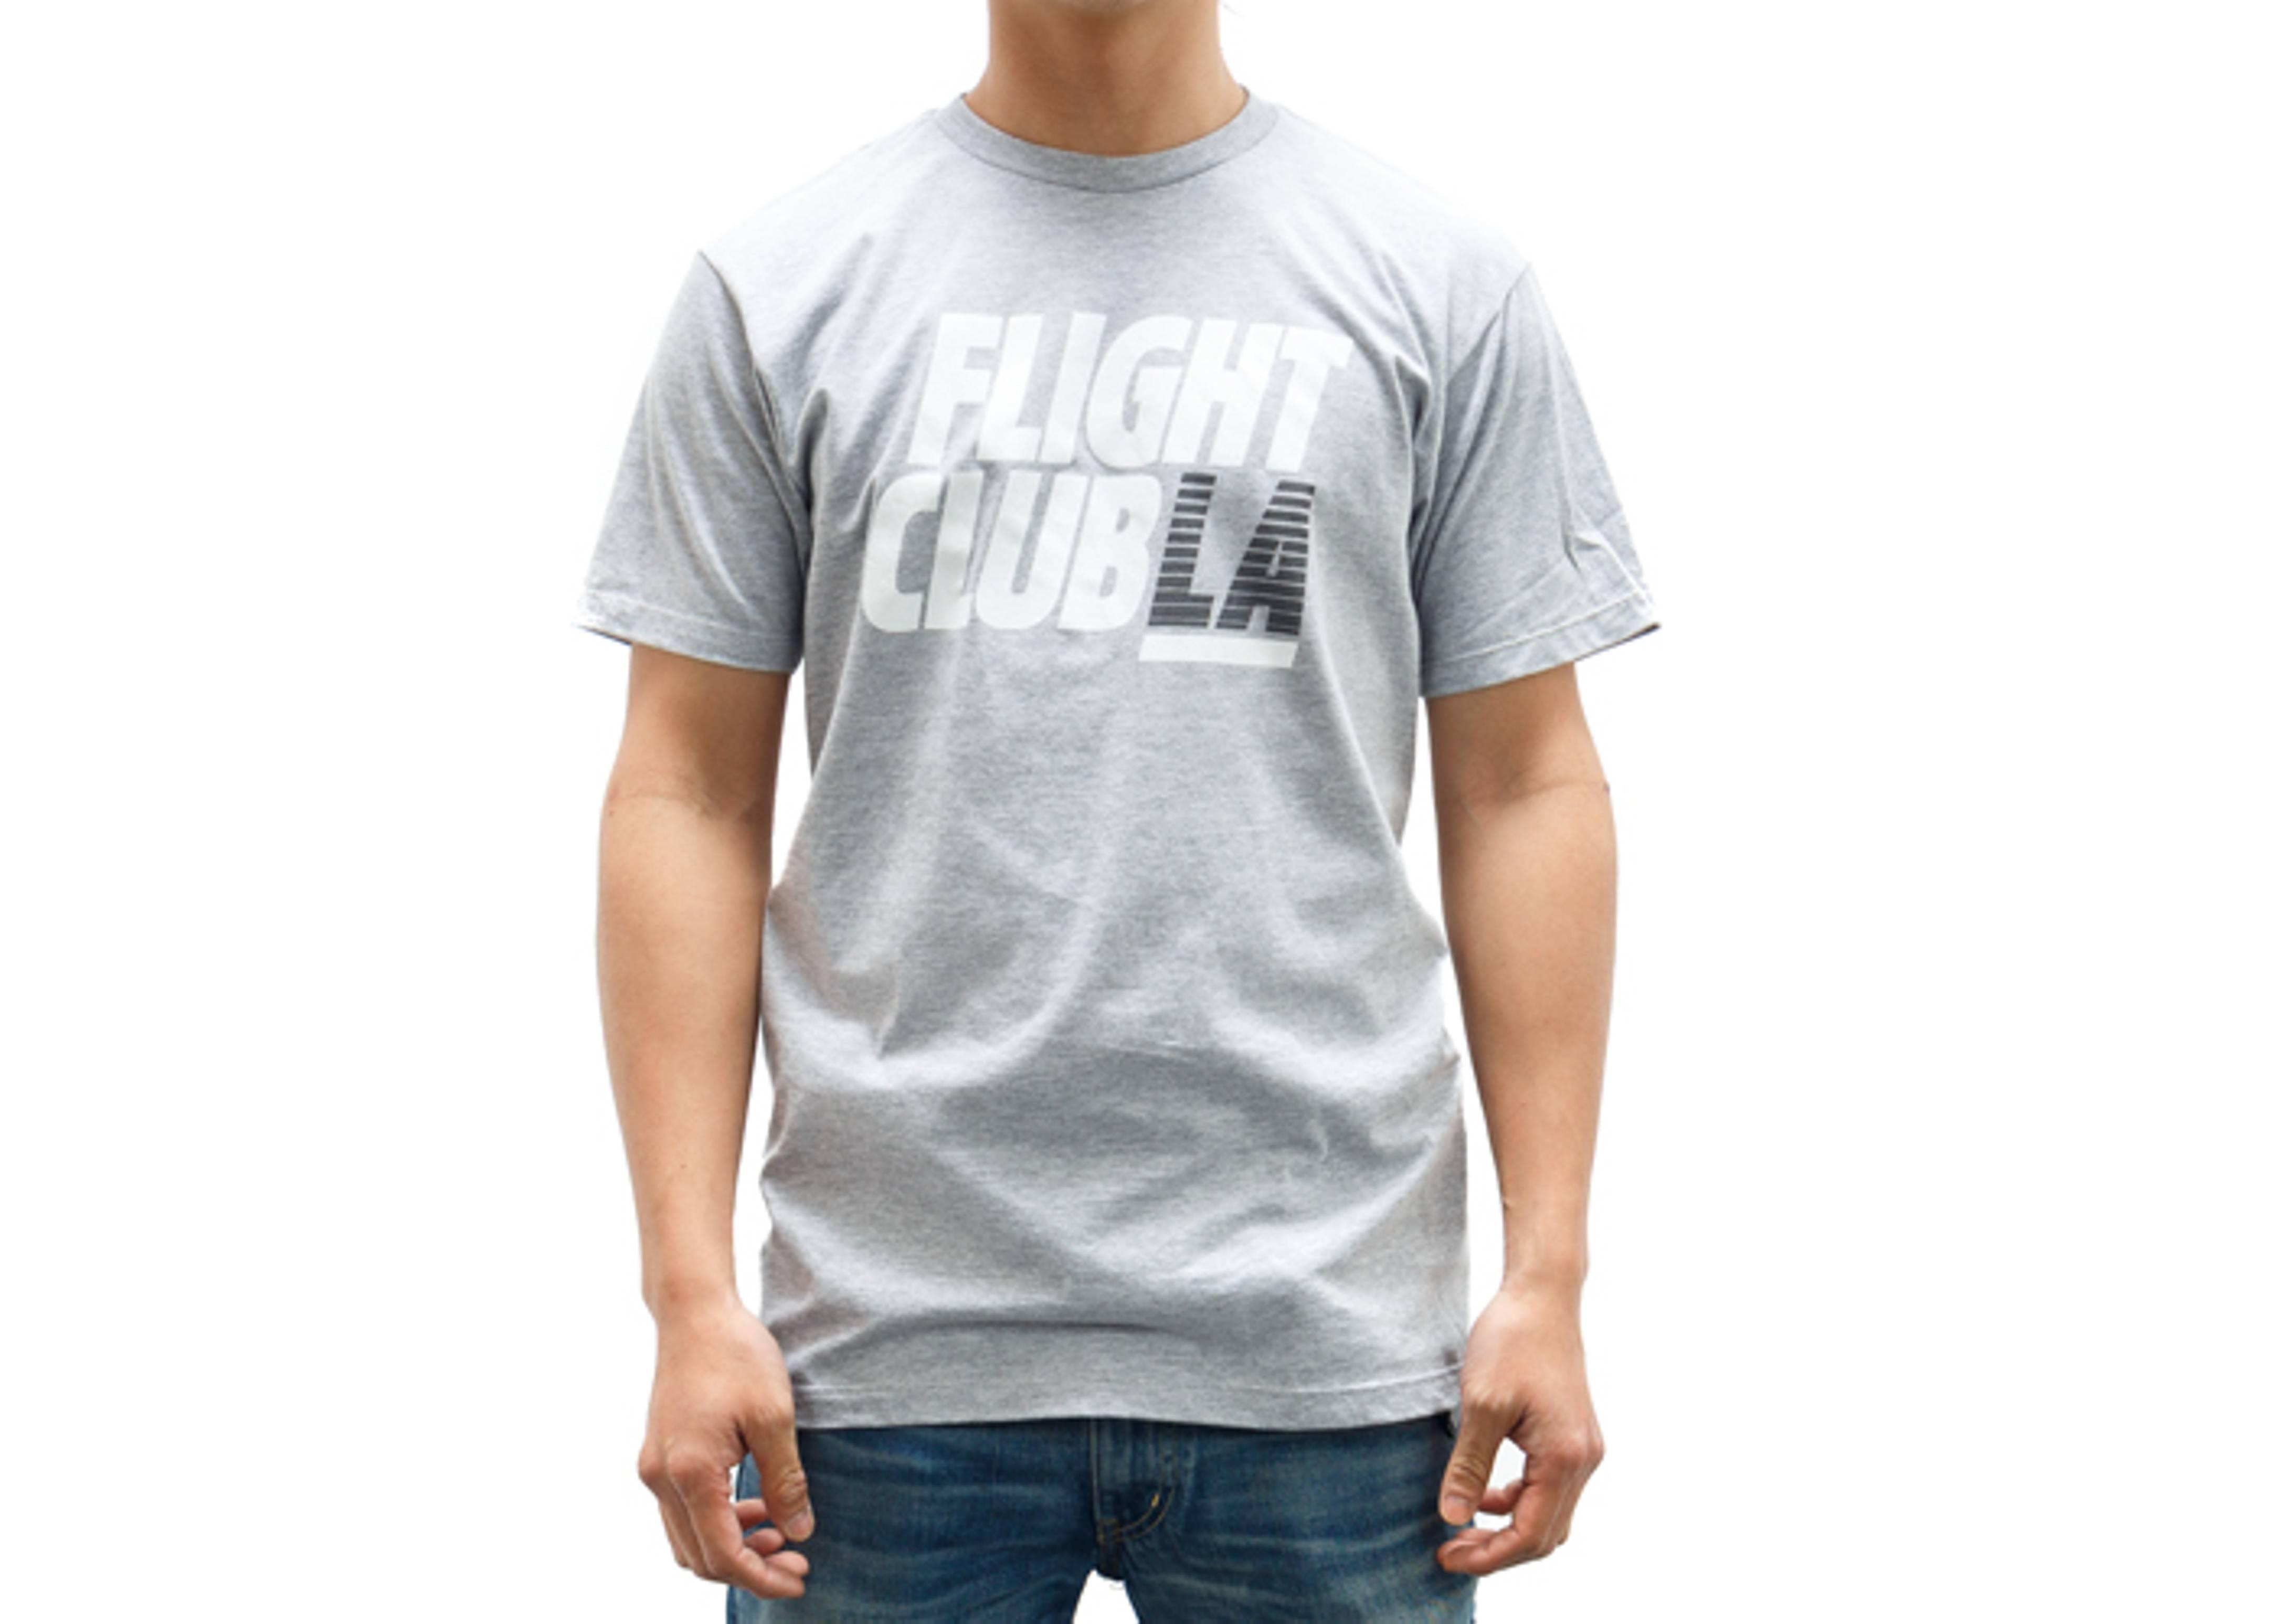 la stacked t-shirt